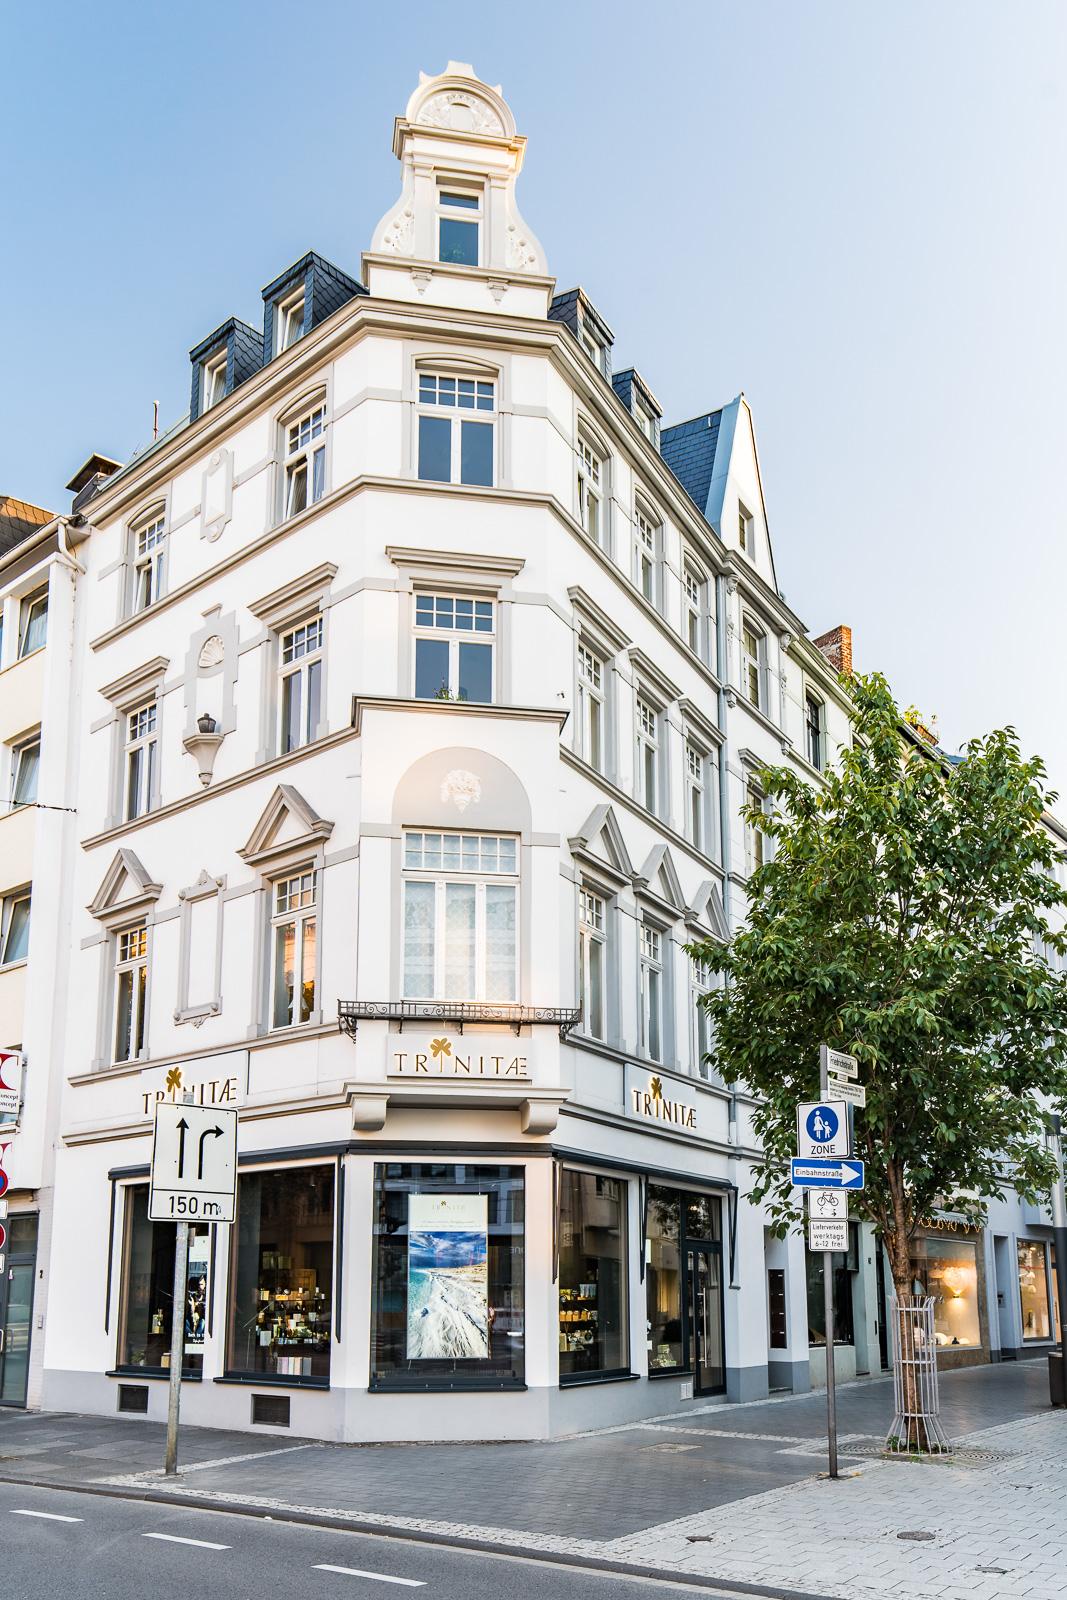 Businessfotografie-Trinitae-Bernadett Yehdou-Fotograf-Friedrichstraße Bonn